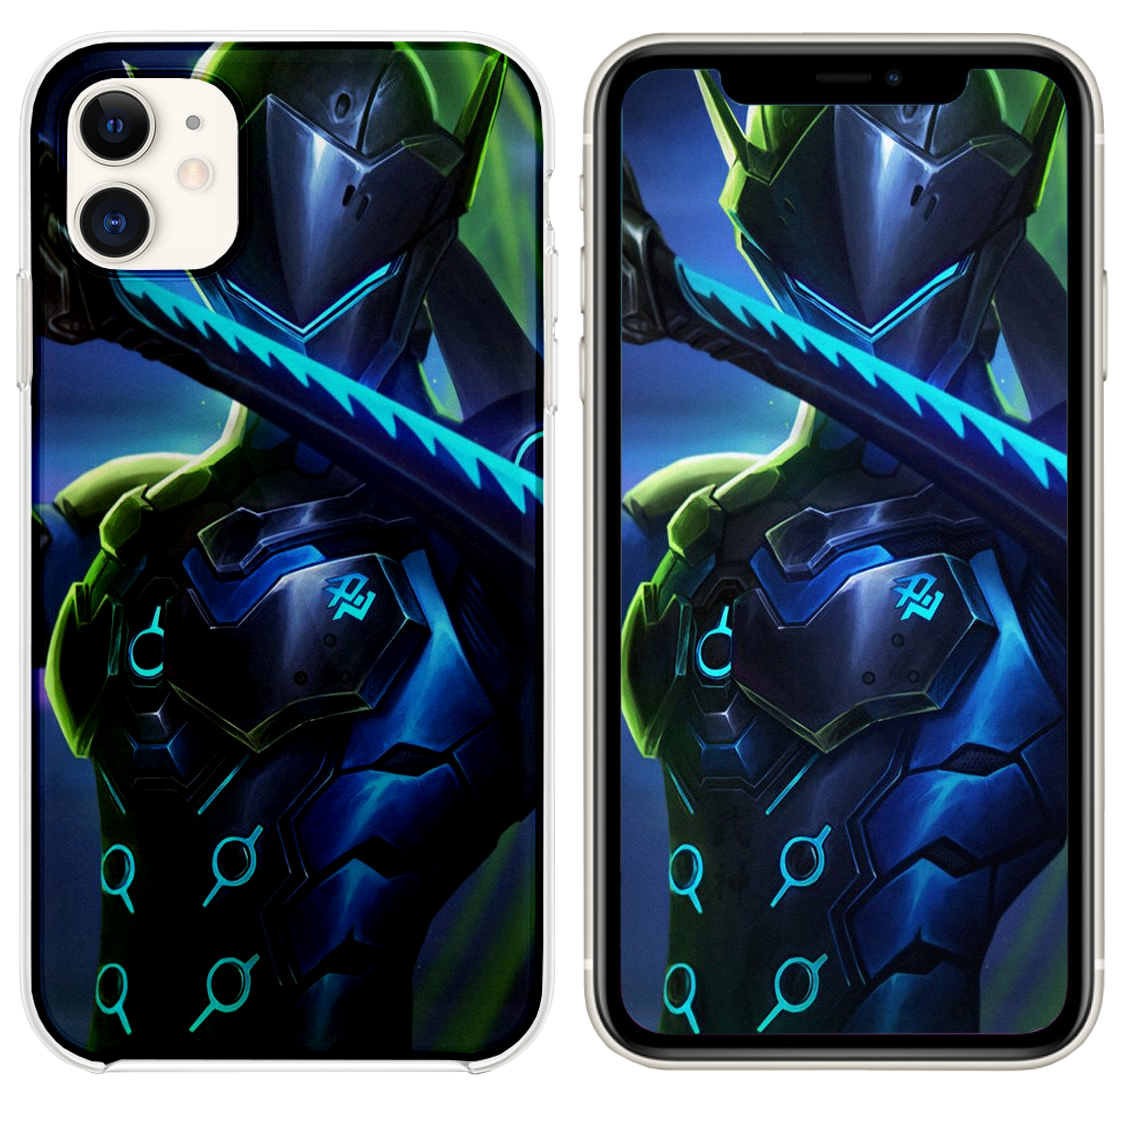 Genji Overwatch Art 4k Iphone 11 Case And Wallpaper Iphone 11 Iphone Iphone Cases